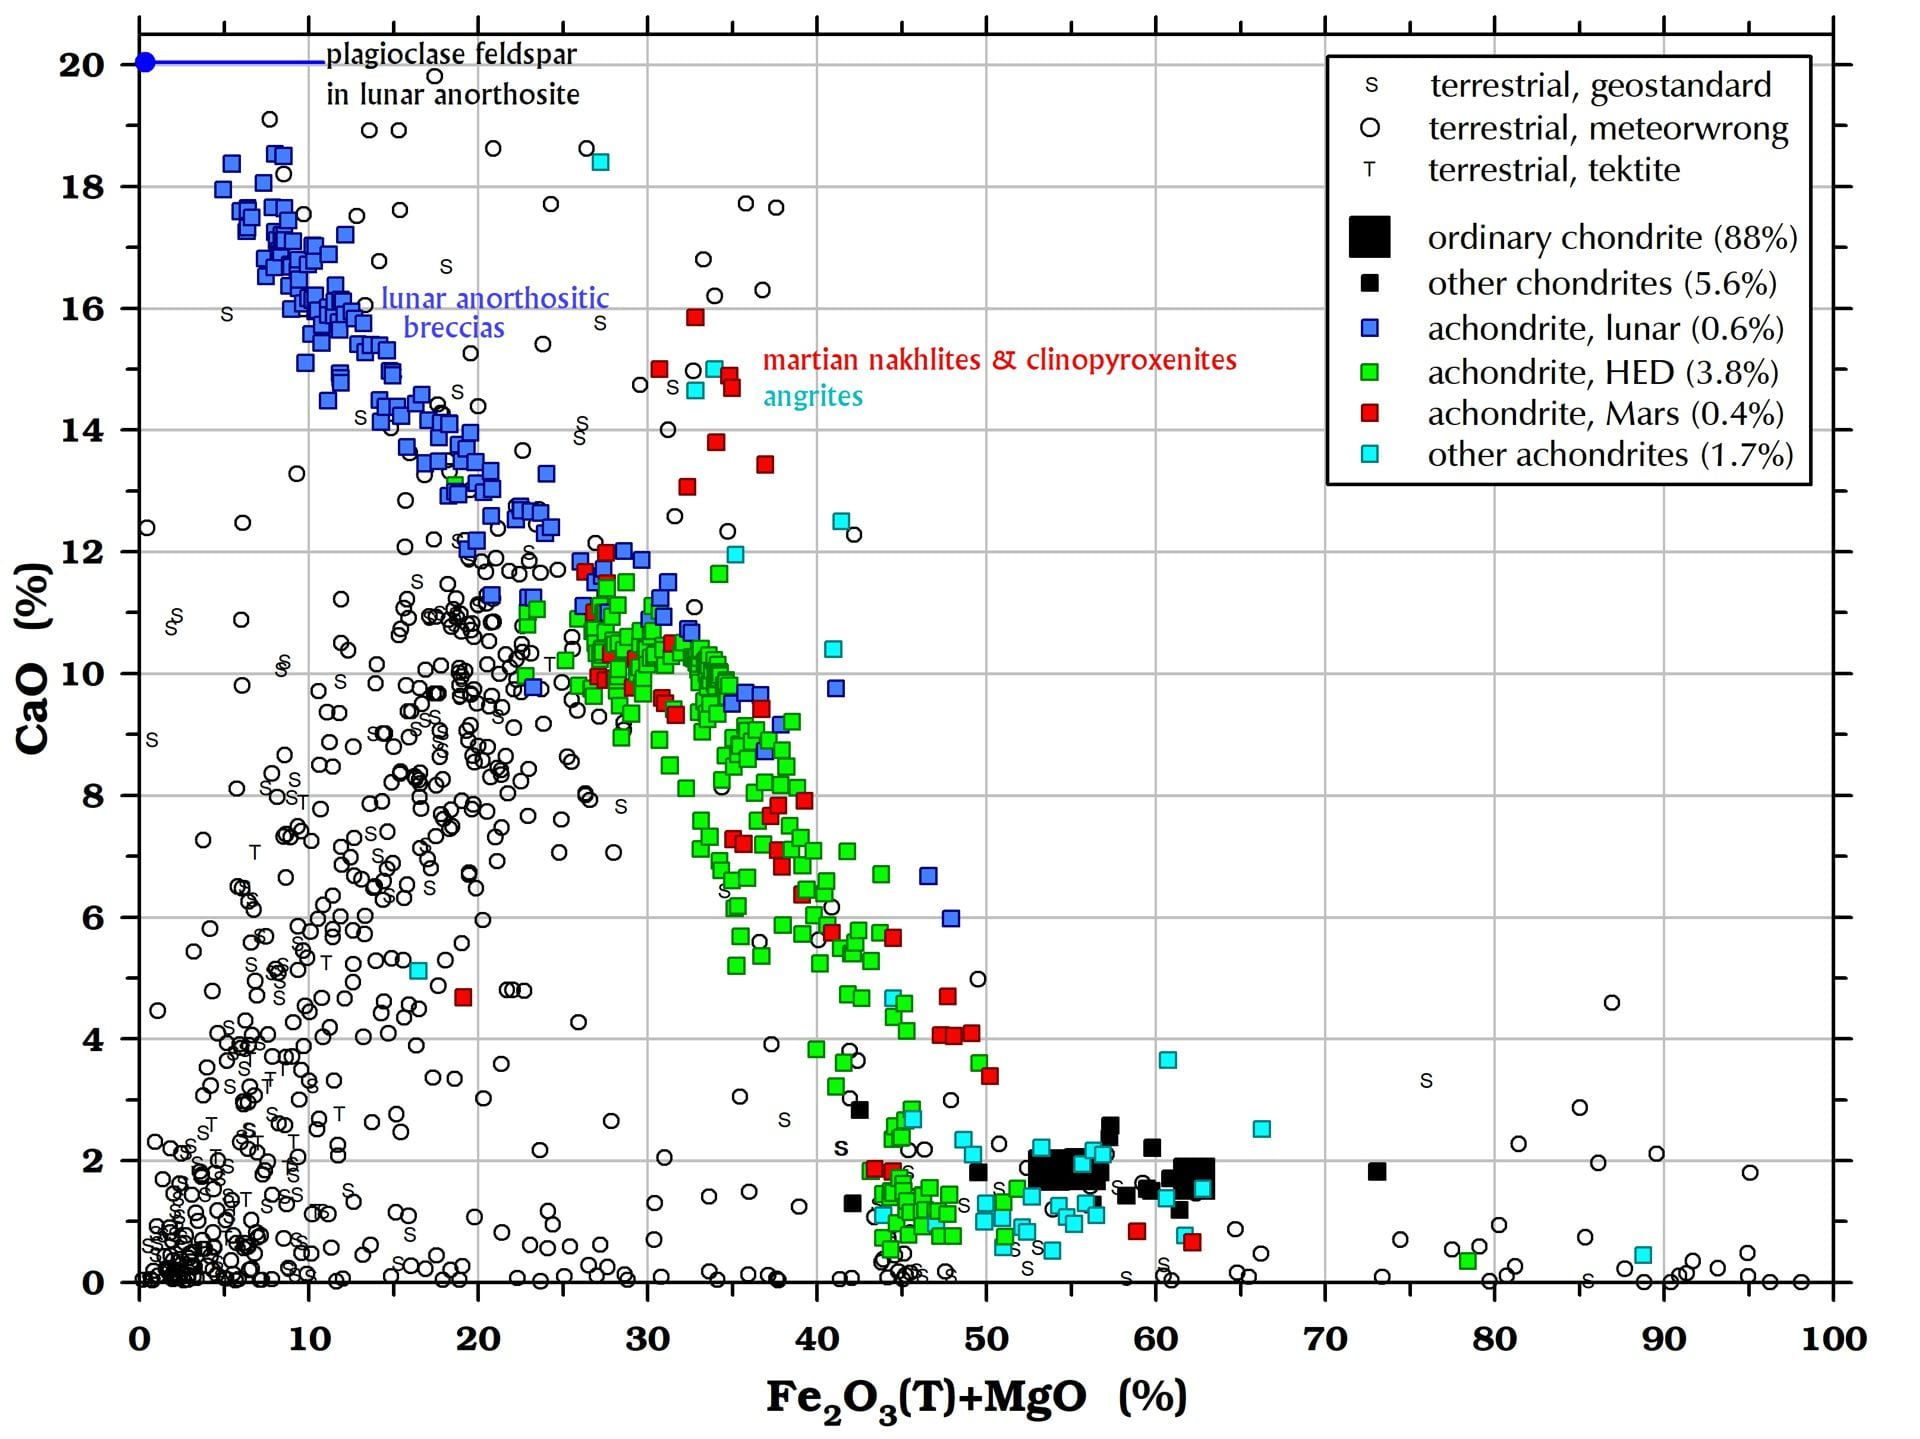 Calcium (CaO) in meteorites and terrestrial rocks